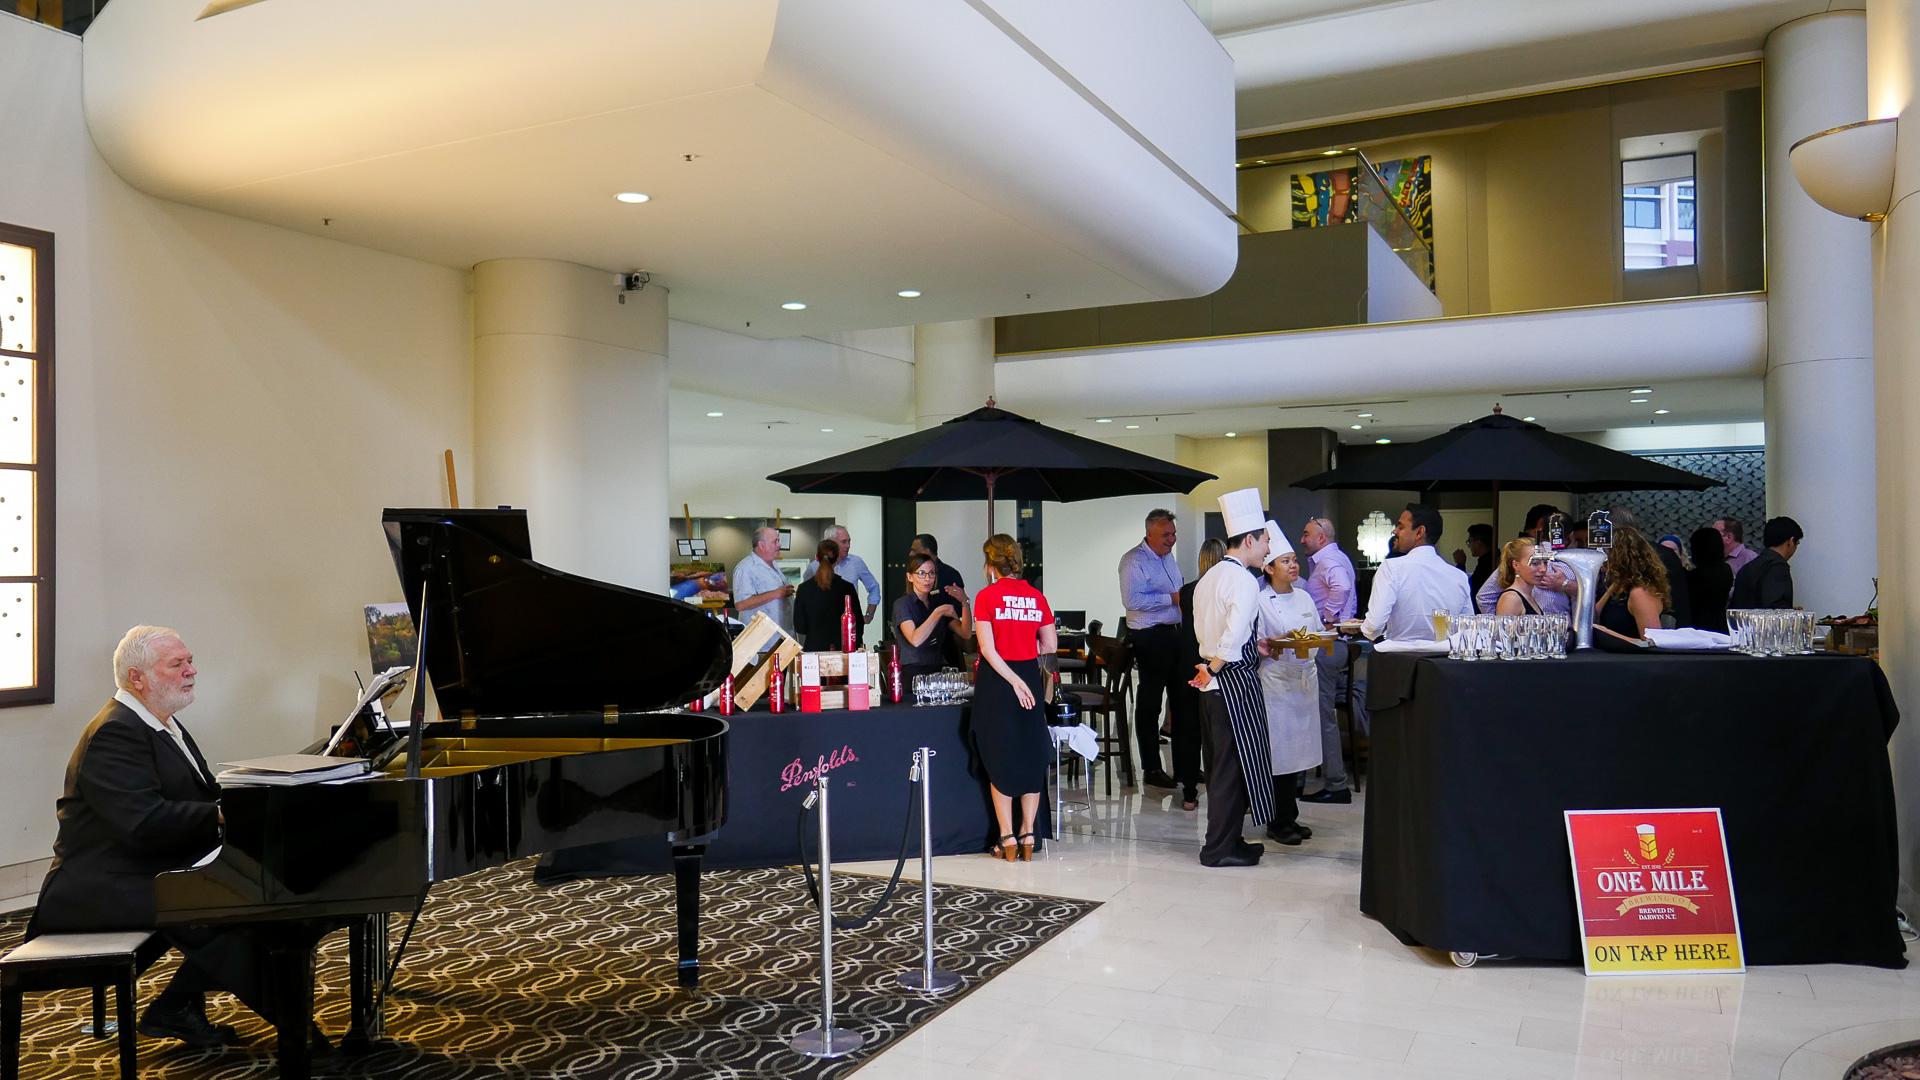 Hilton Unwine Event 2017